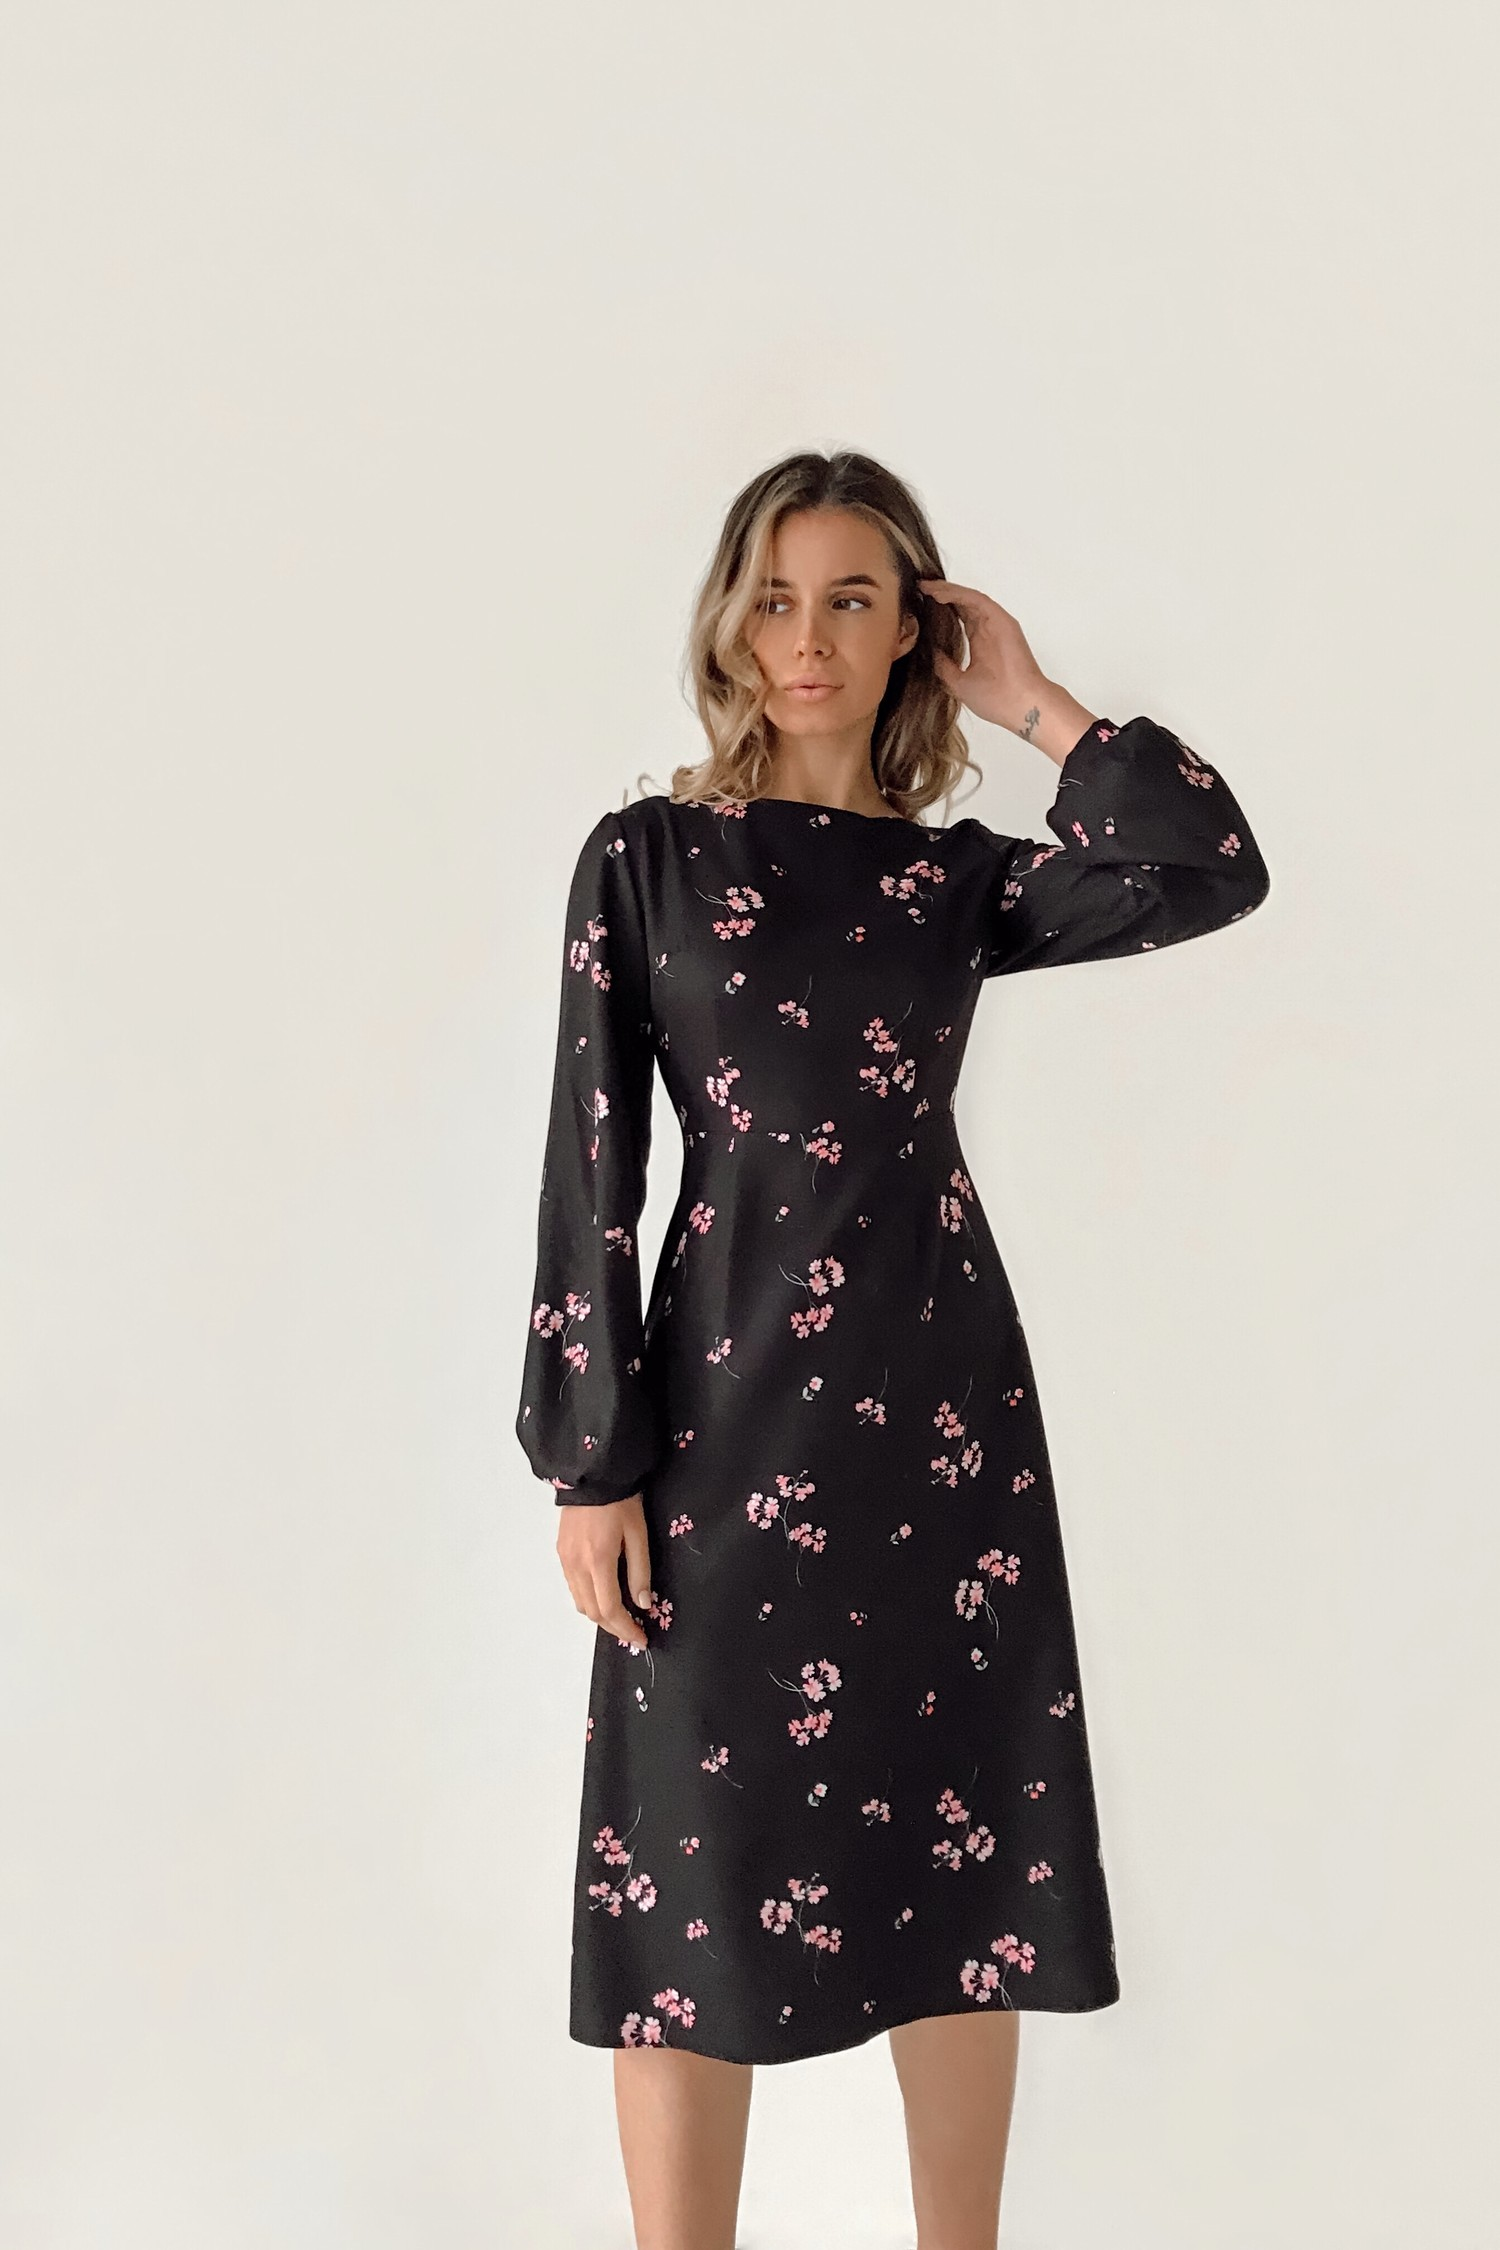 Платье миди черное Pink flowers - THE LACE